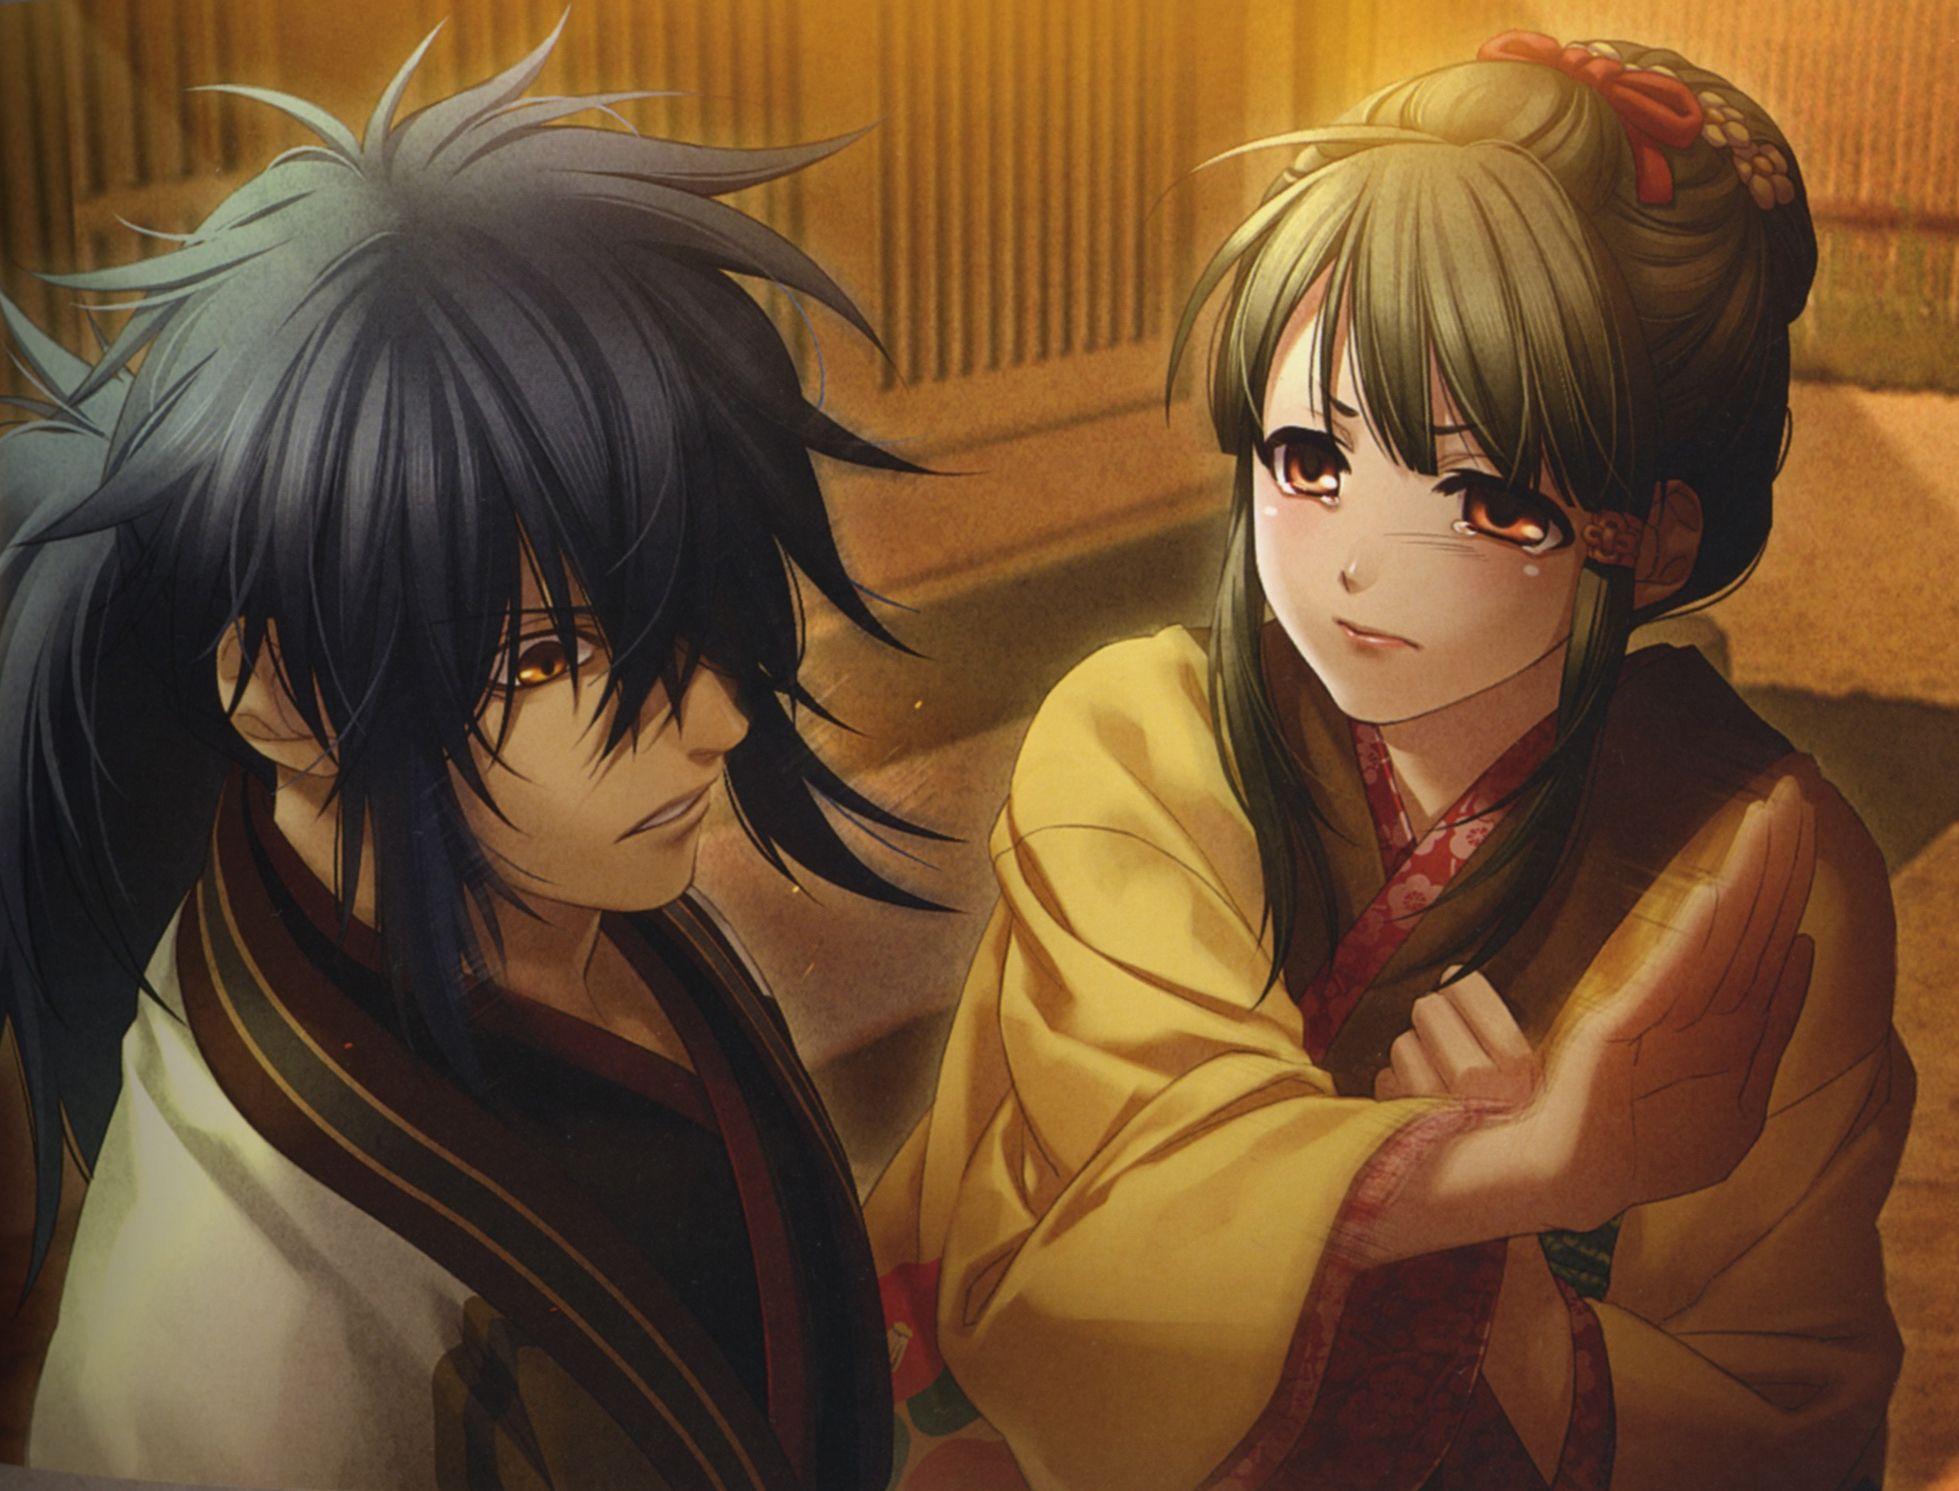 hakuouki shinsengumi kitan ibuki ryunosuke amp kosuzu